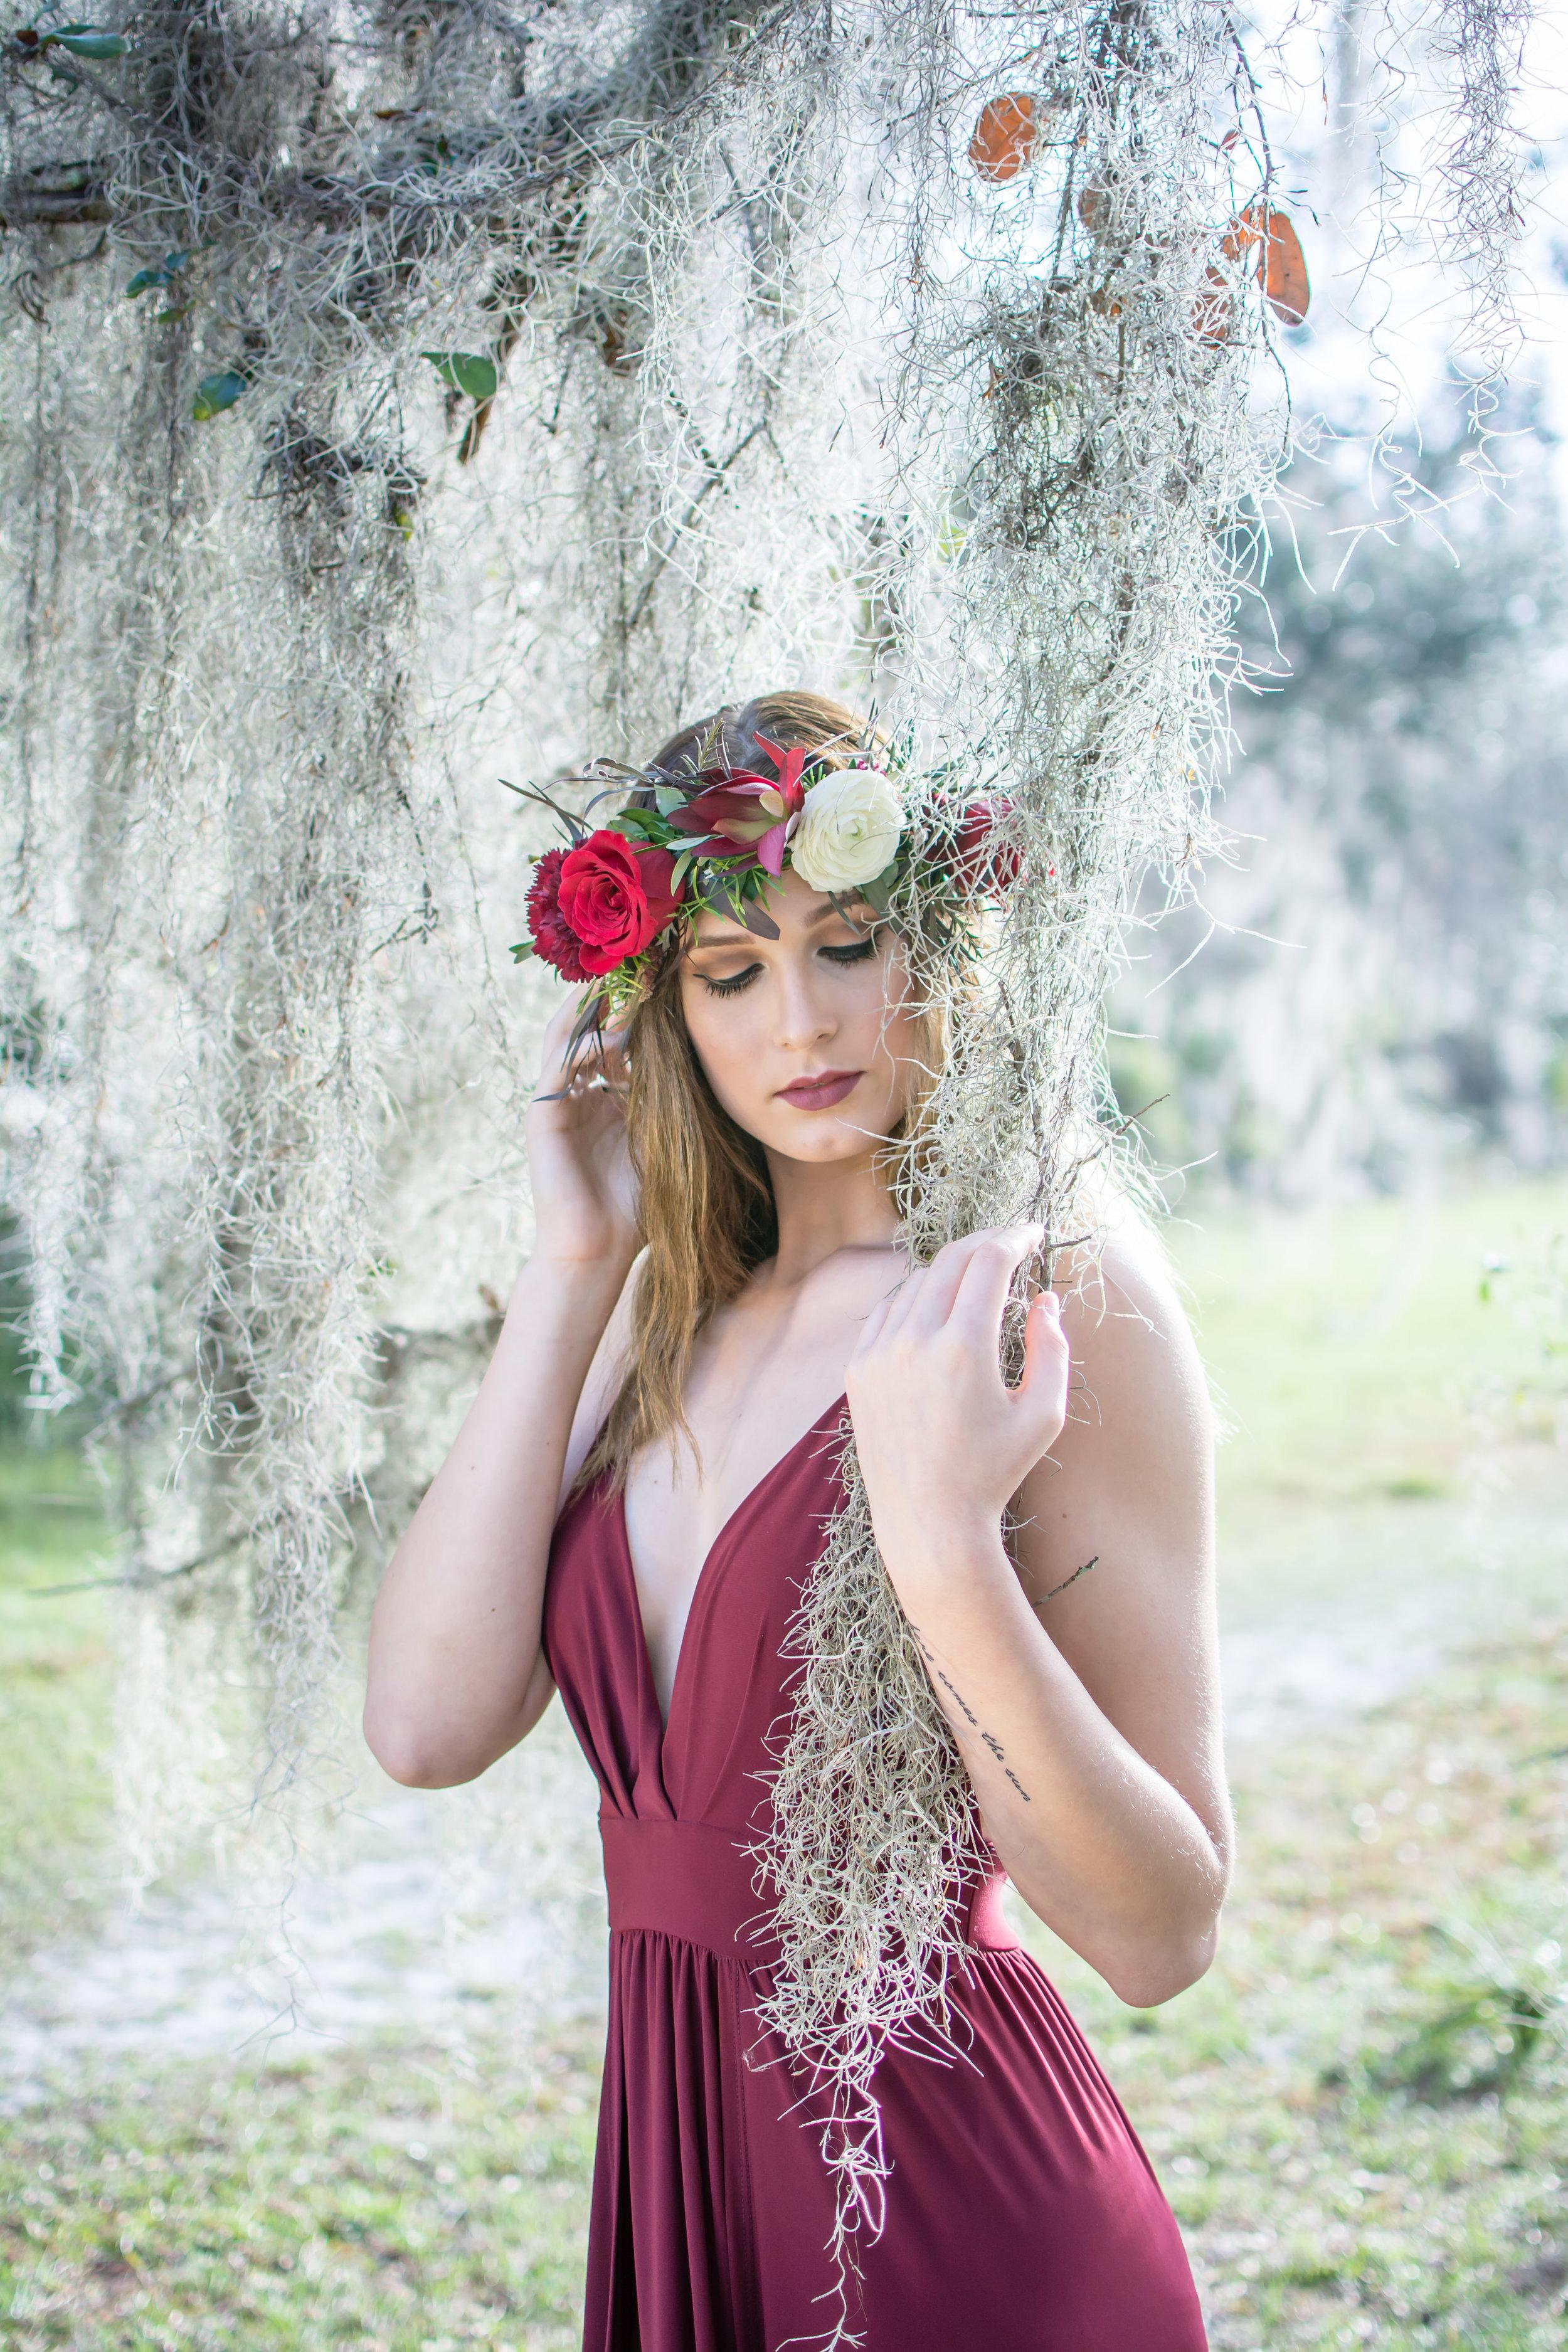 whimsical-bridal-inspiration-fashion-photoshoot-geneva-photographer-yanitza-ninett-28.jpg